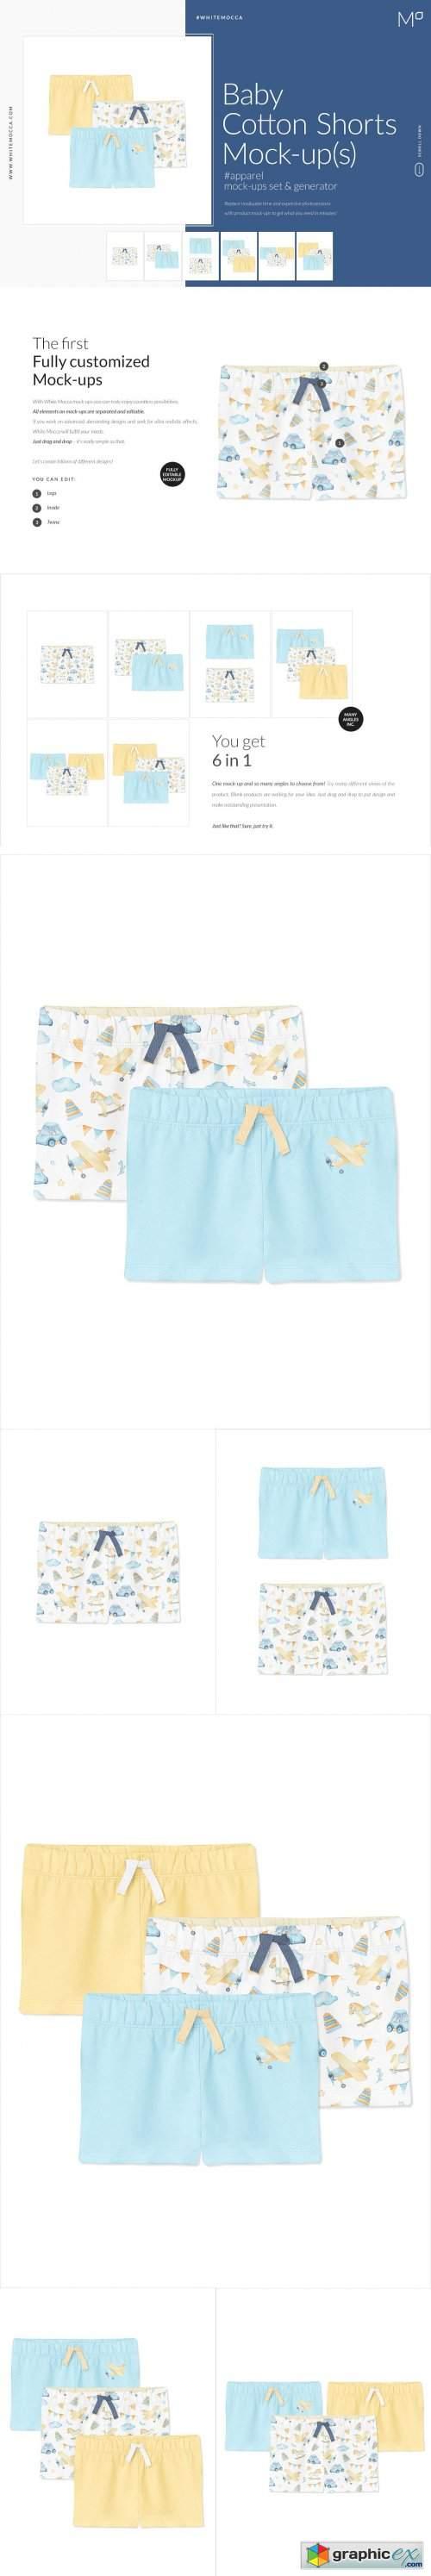 Baby Cotton Shorts Mock-ups Set